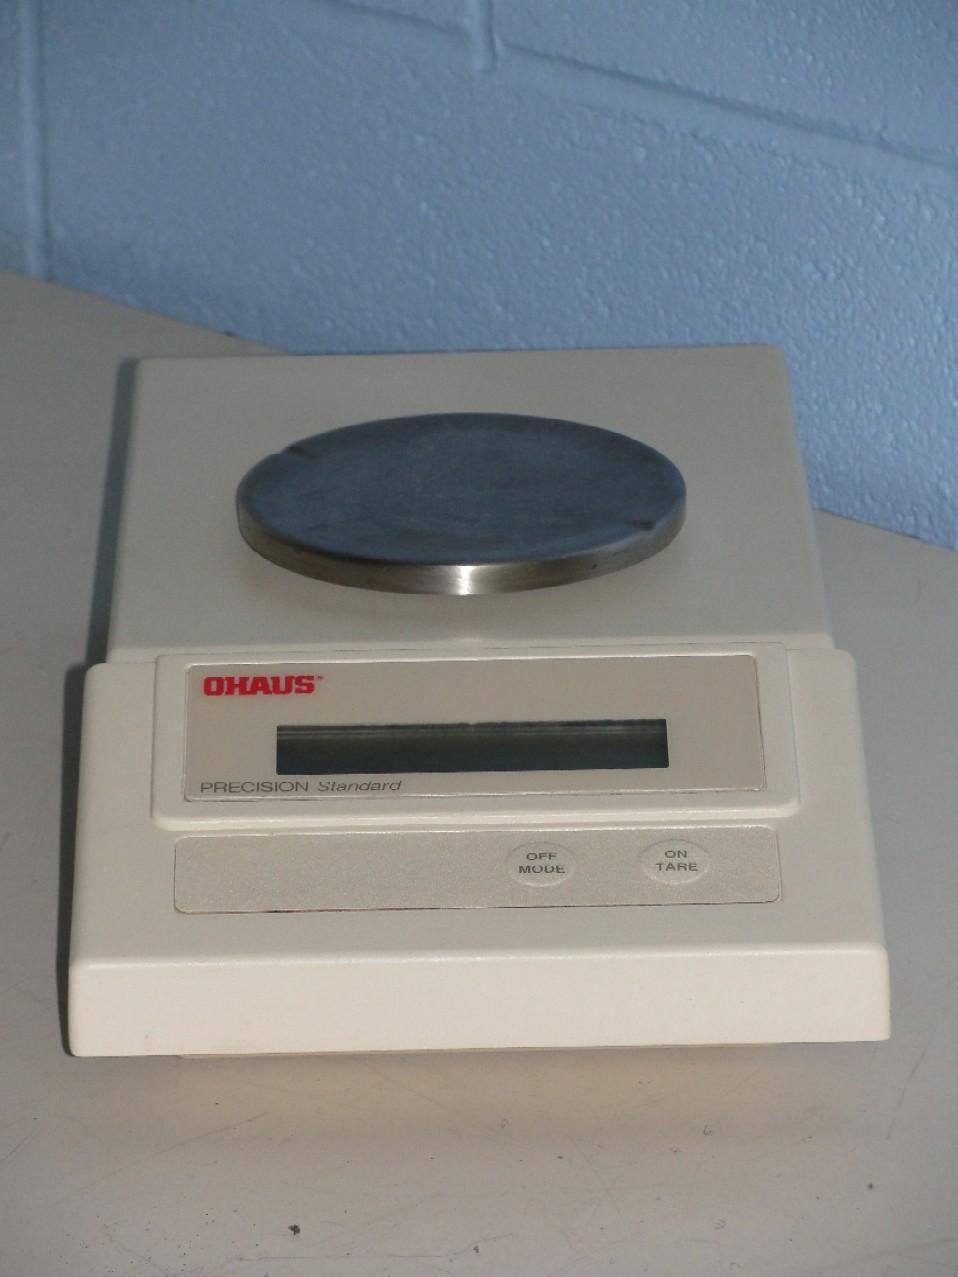 Ohaus Precision Standard Weighing Balance Image